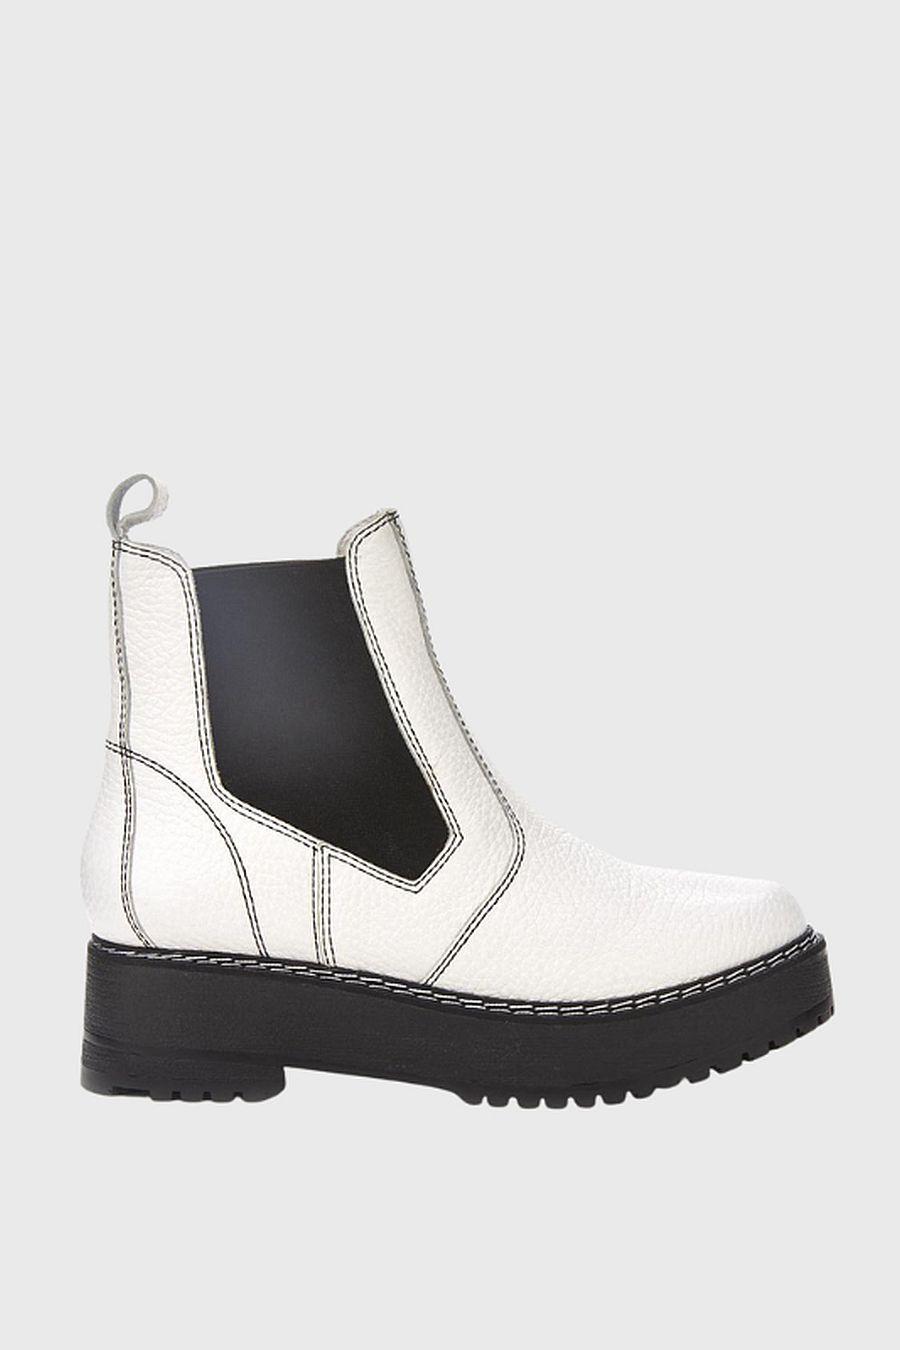 Matisse Footwear Mason Chelsea Boot - white